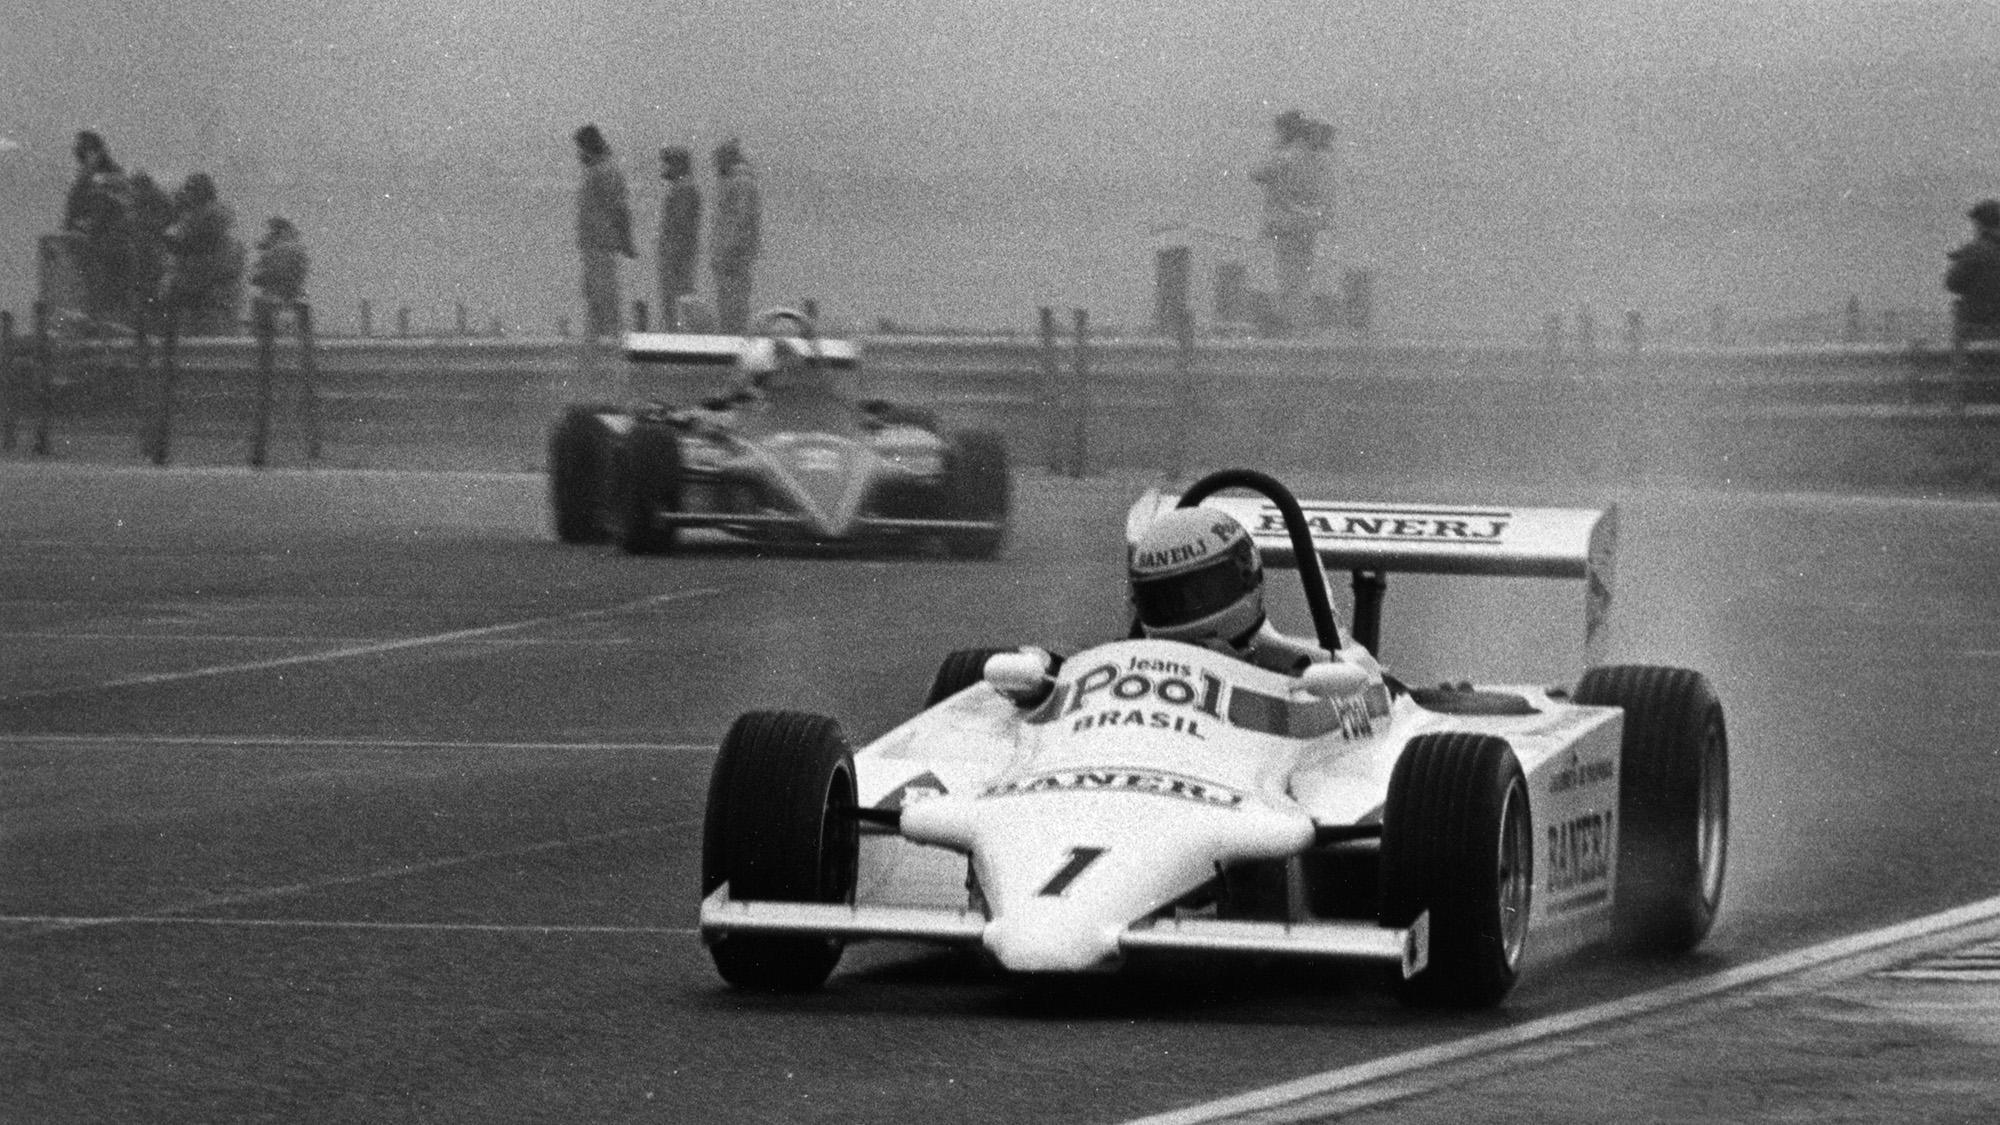 Ayrton Senna in a Ralt RT3 in a Formula 3 race at Thruxton in 1983